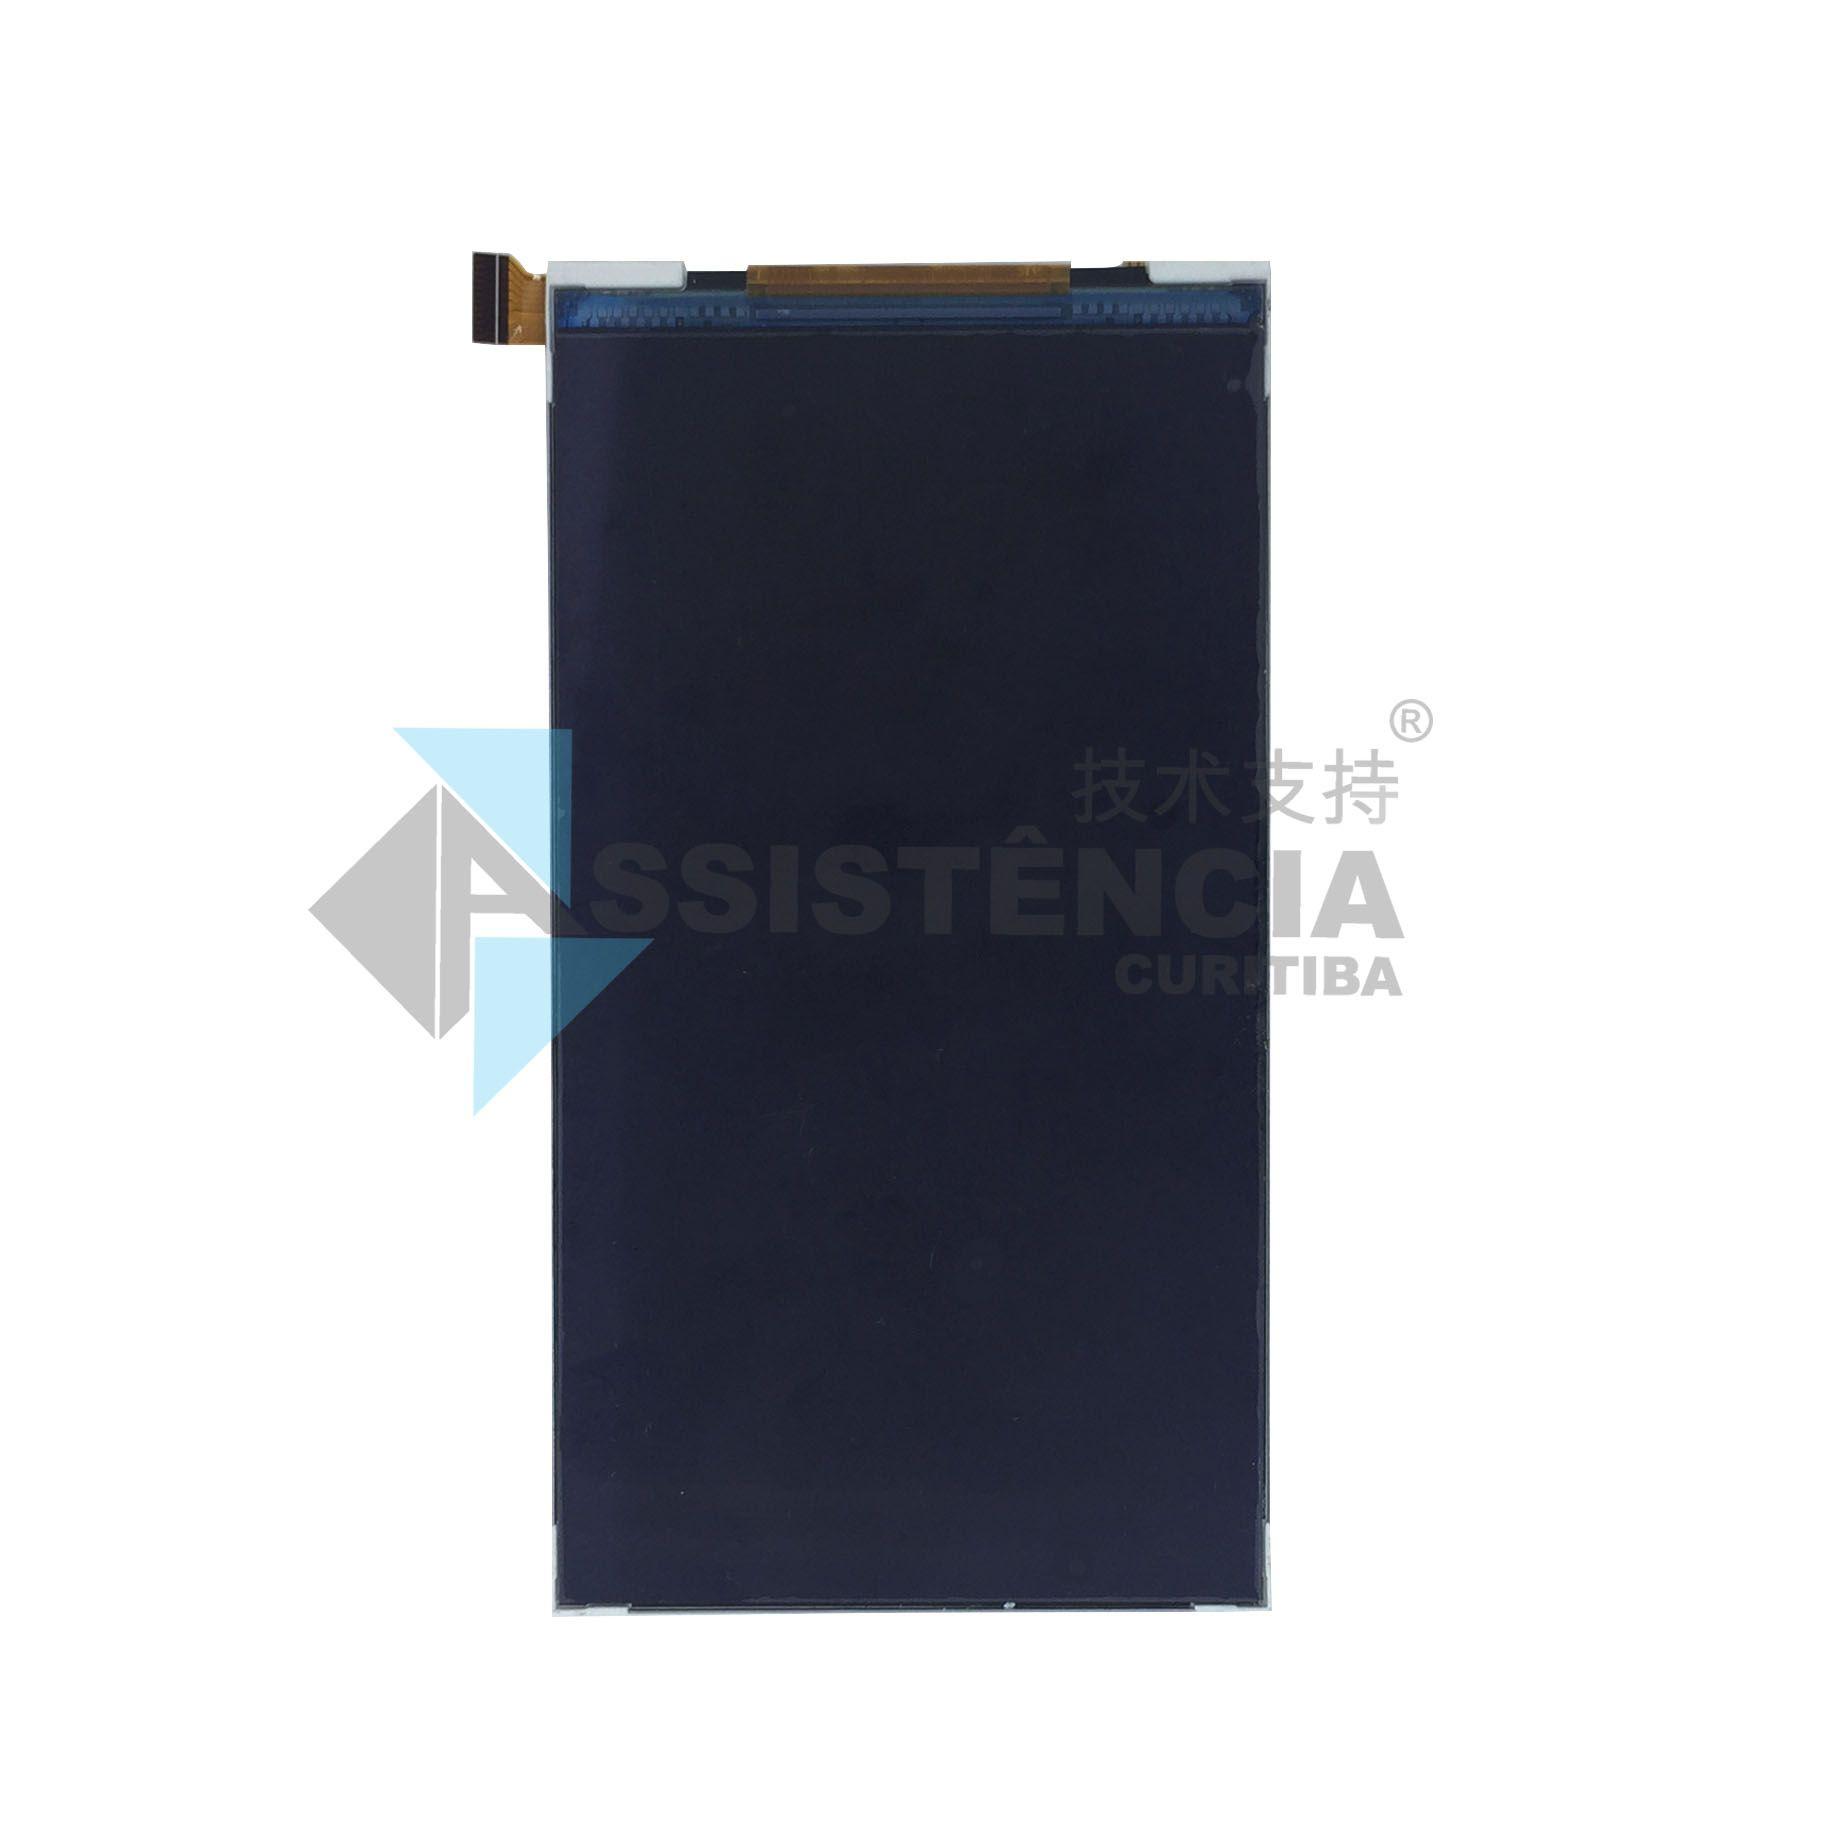 Display Blu Grand Hd G010